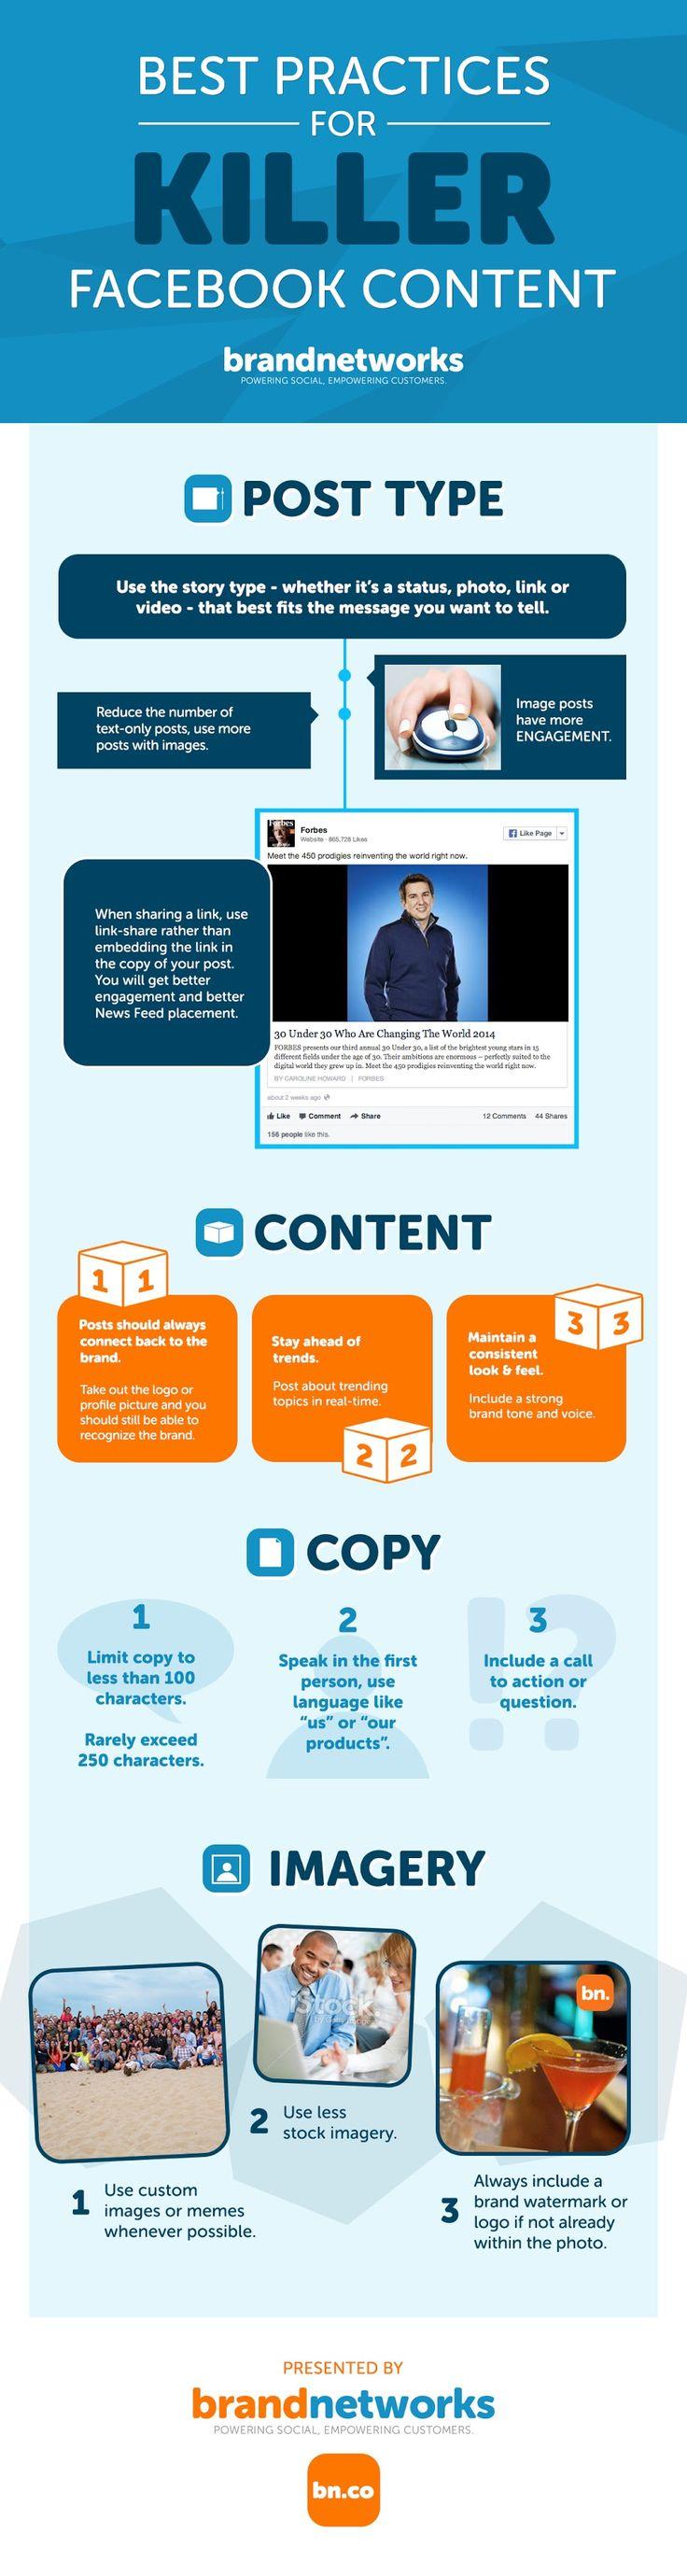 Best Practices for Killer Facebook Content